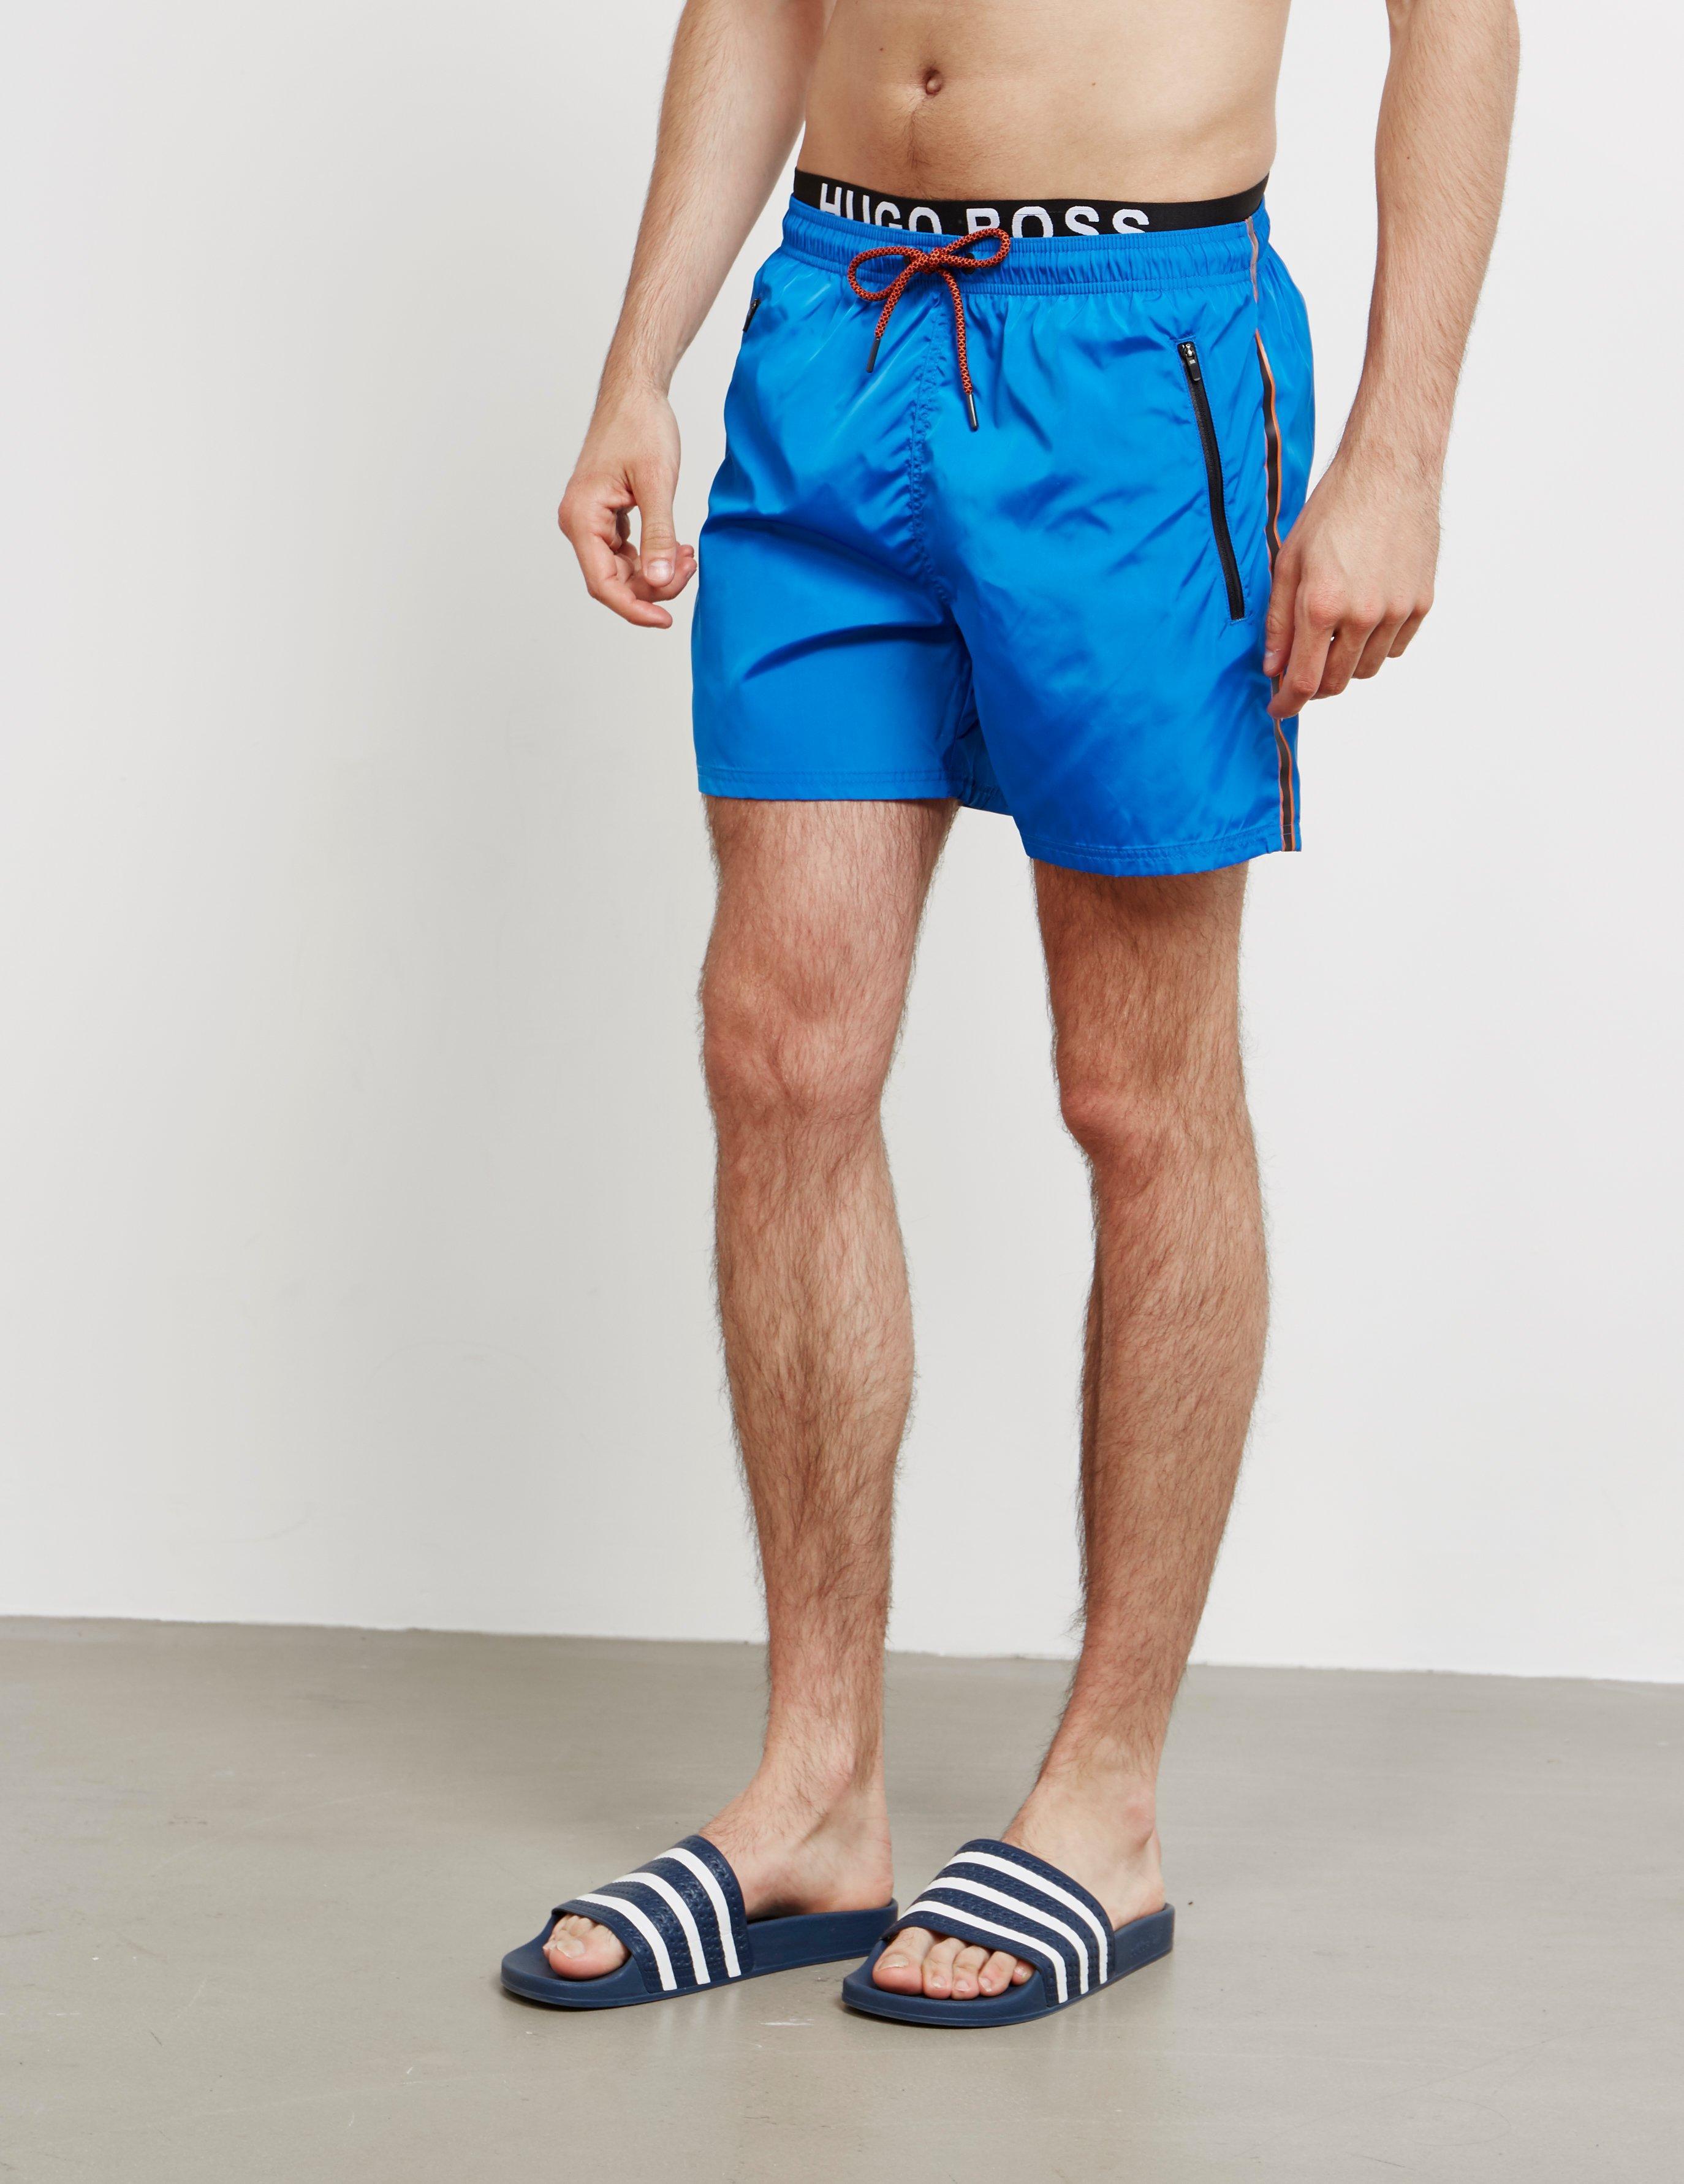 6511d4481e BOSS Thornfish Waistband Swim Shorts Blue in Blue for Men - Lyst